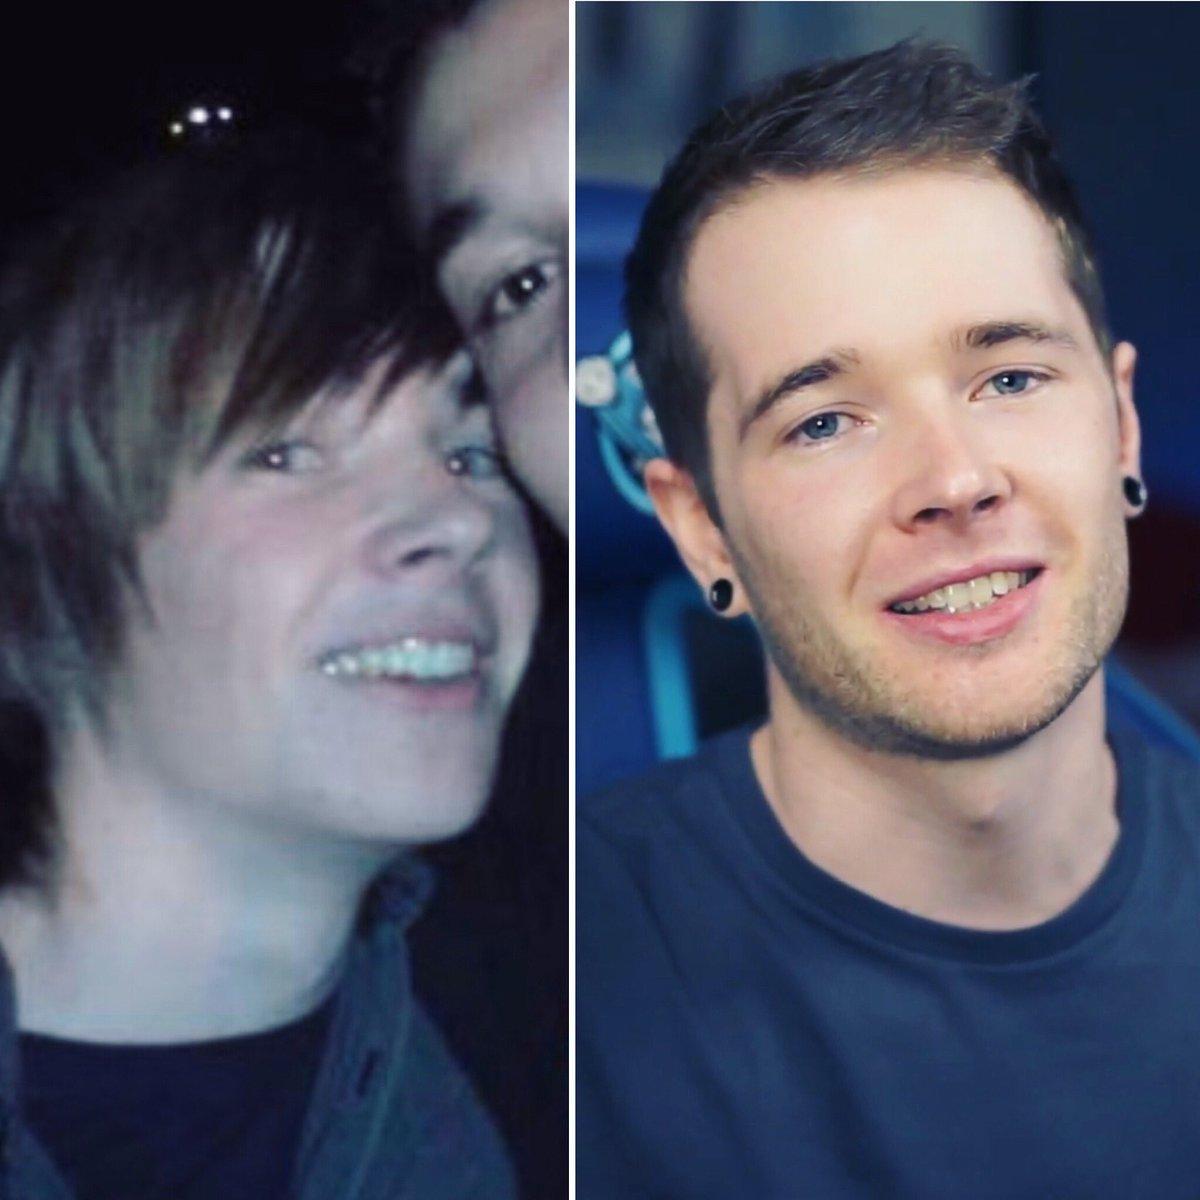 RT @dantdm: 10 years. Cut my hair. 🙃😂 #2009vs2019 https://t.co/KDlQMpheAn